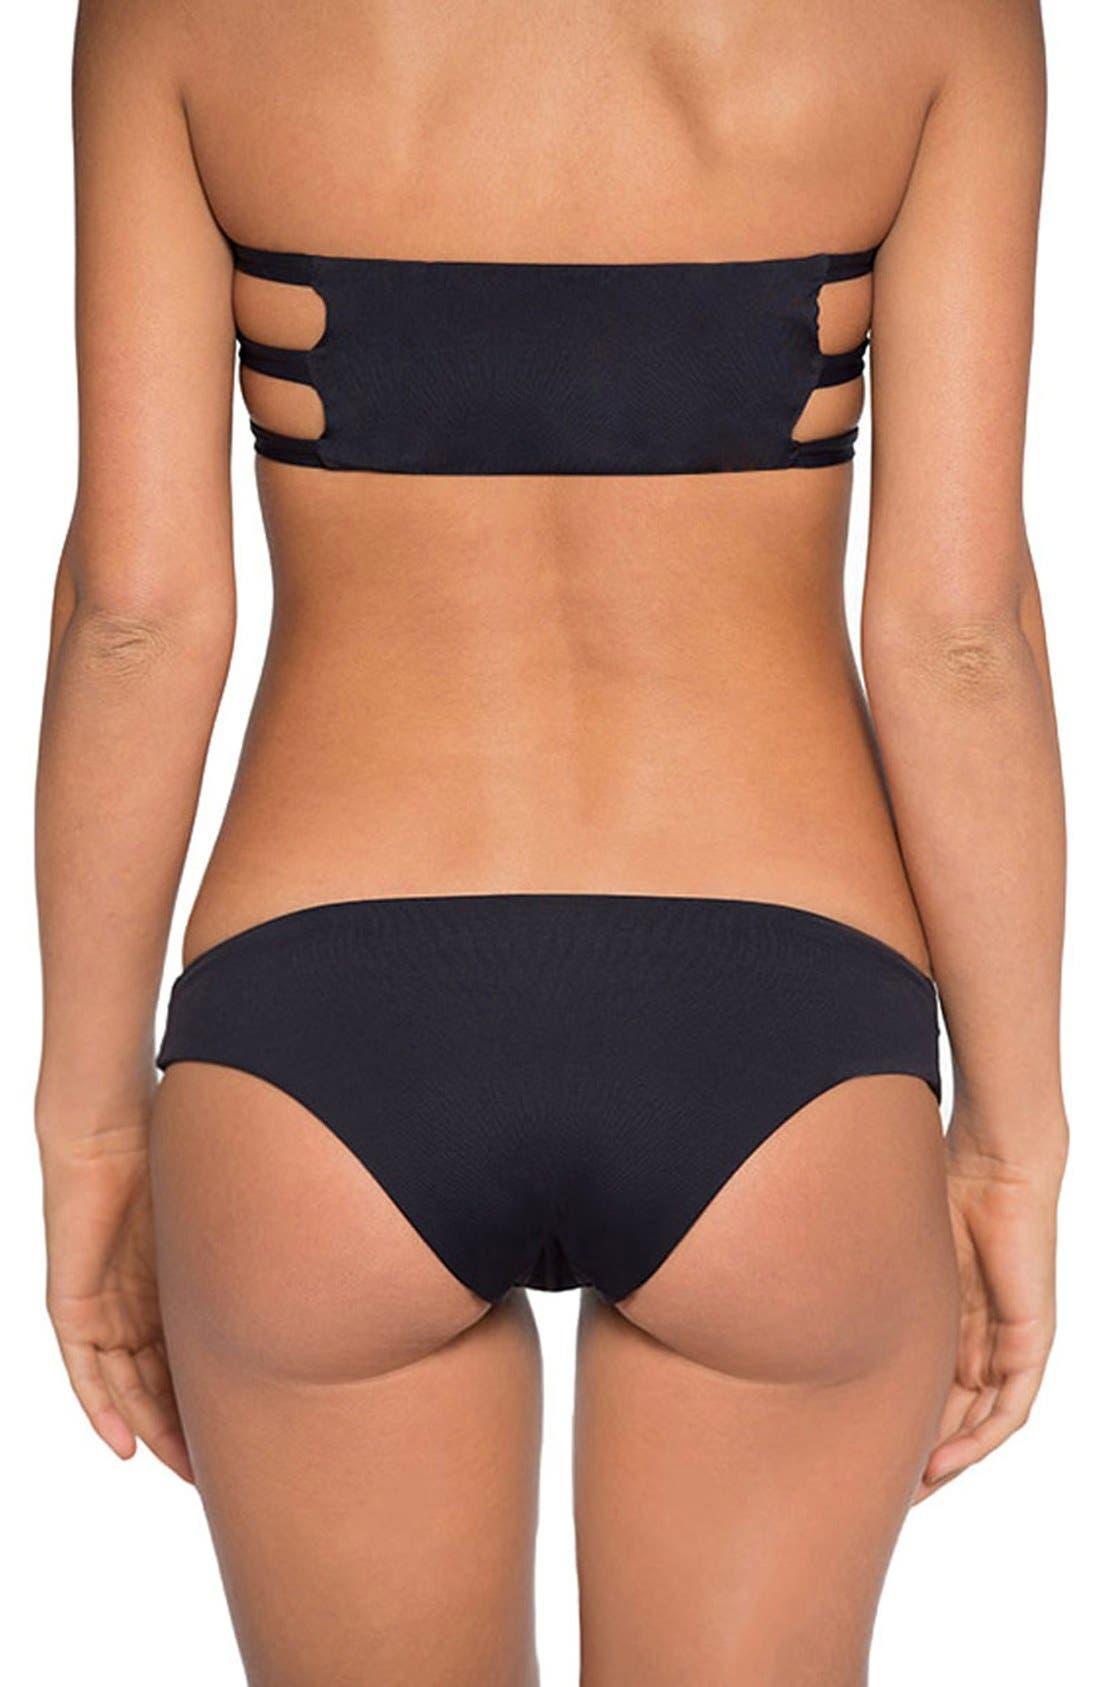 'Ali' Moderate Coverage Bikini Bottoms,                             Alternate thumbnail 7, color,                             Black